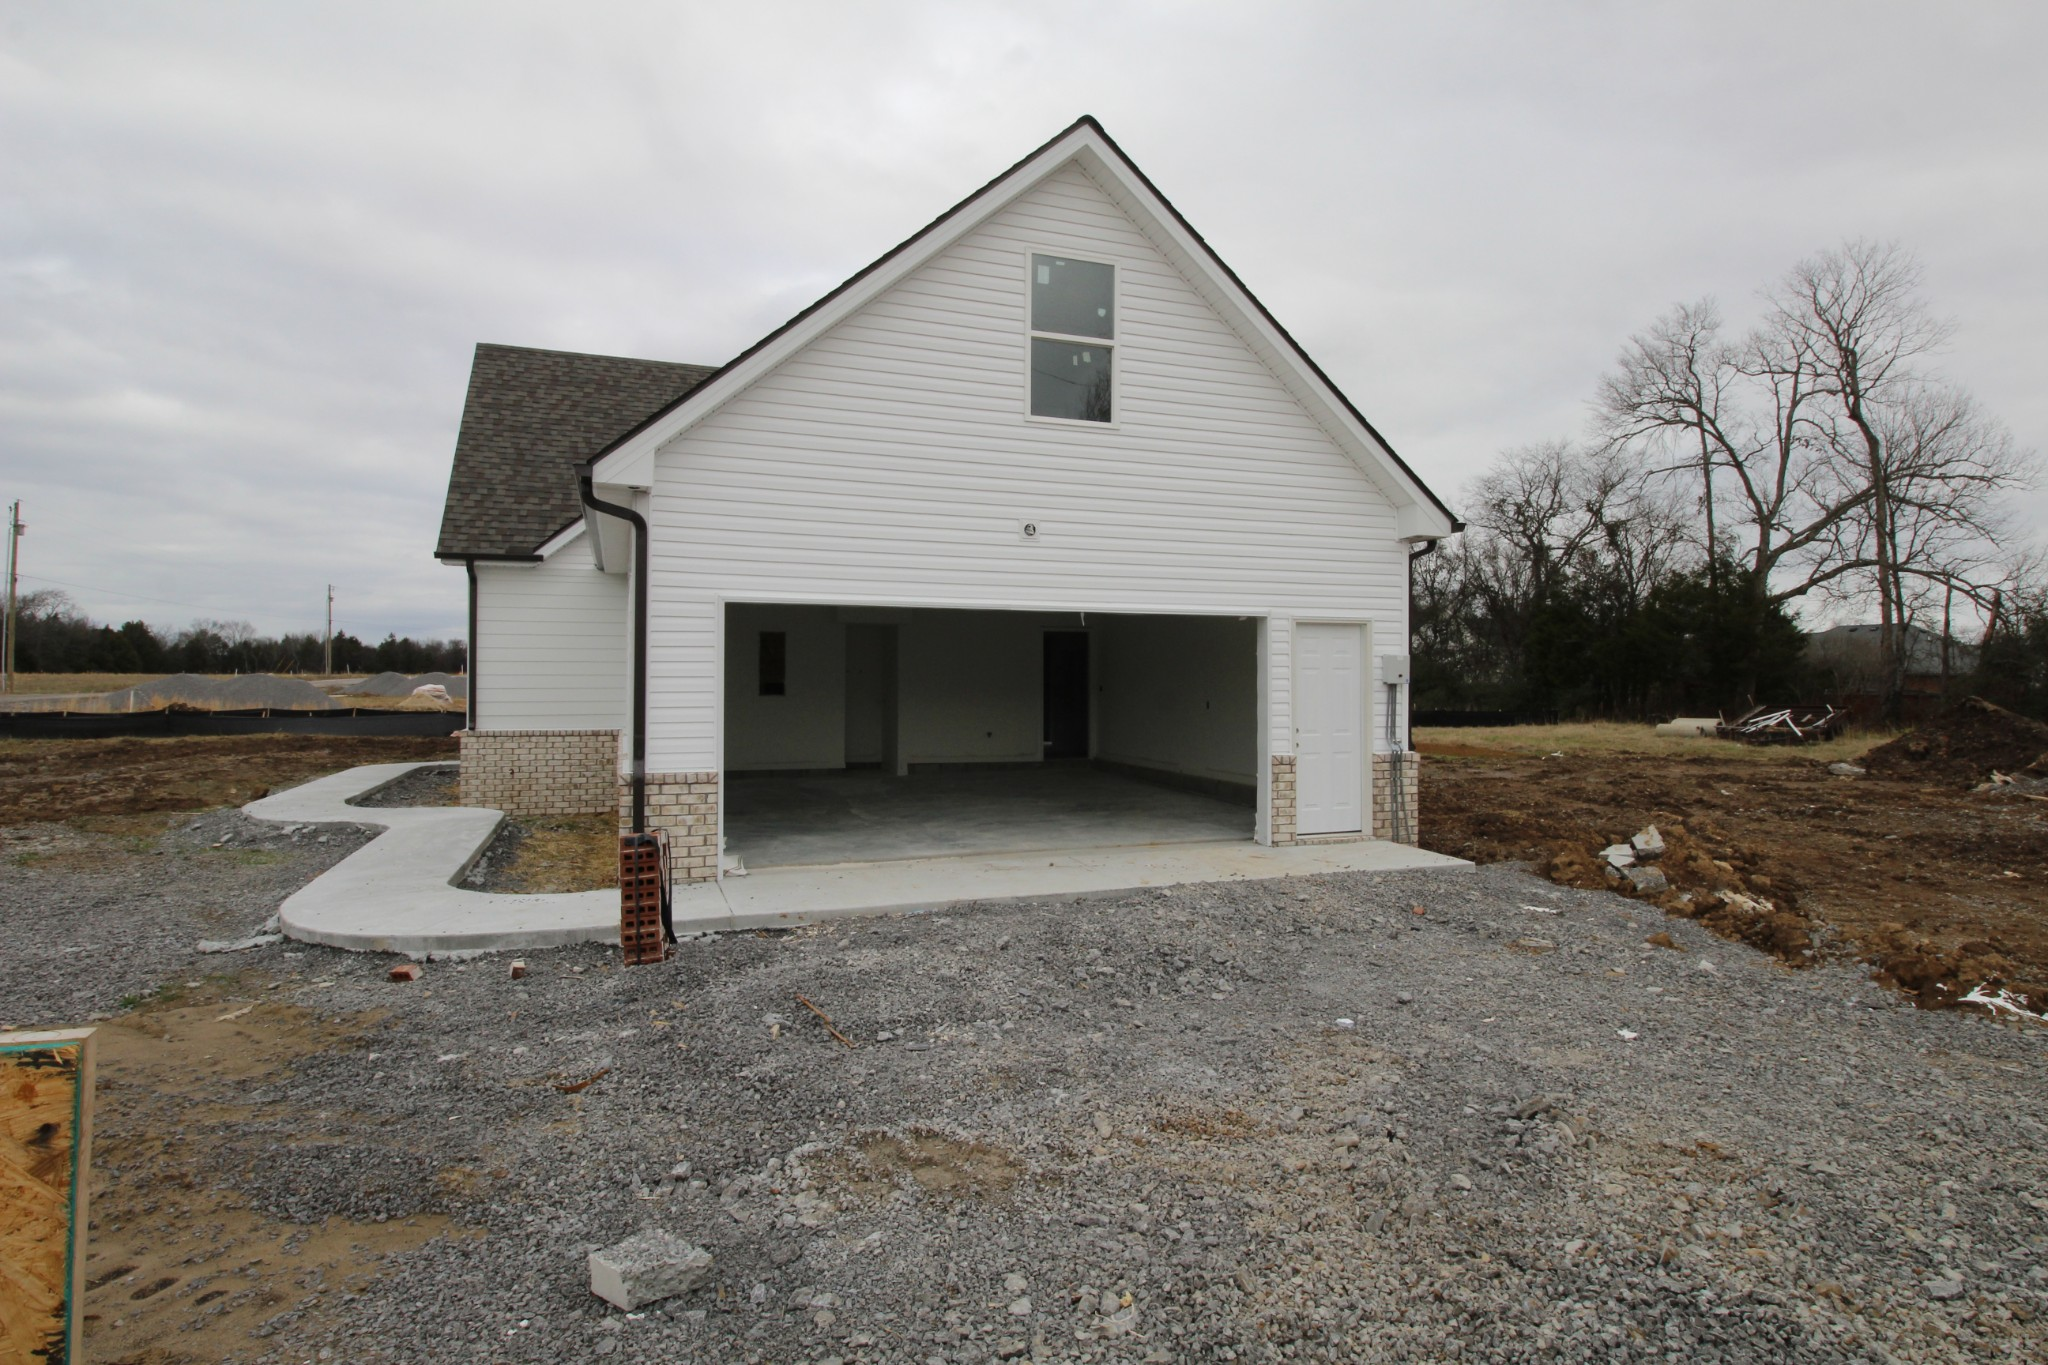 427 Skipping Stone Rd Lot 208, Christiana, TN 37037 - Christiana, TN real estate listing